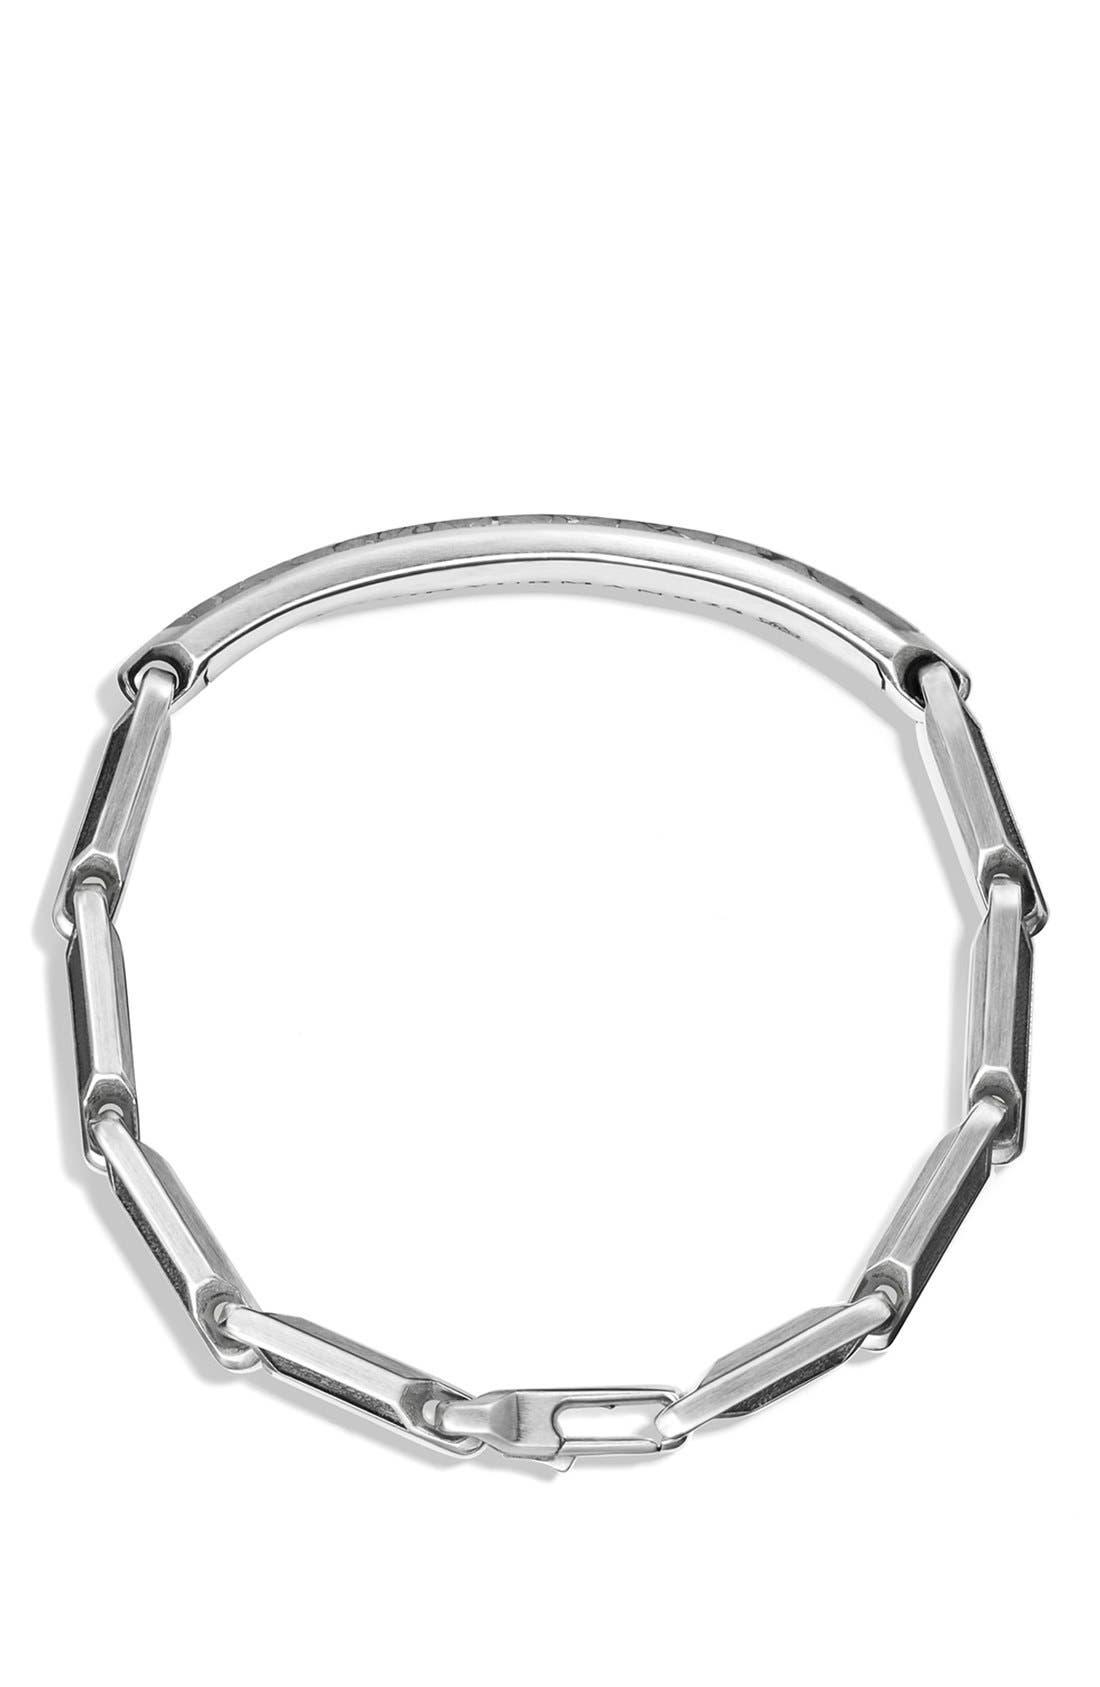 Alternate Image 2  - David Yurman 'Meteorite' Fused ID Bracelet